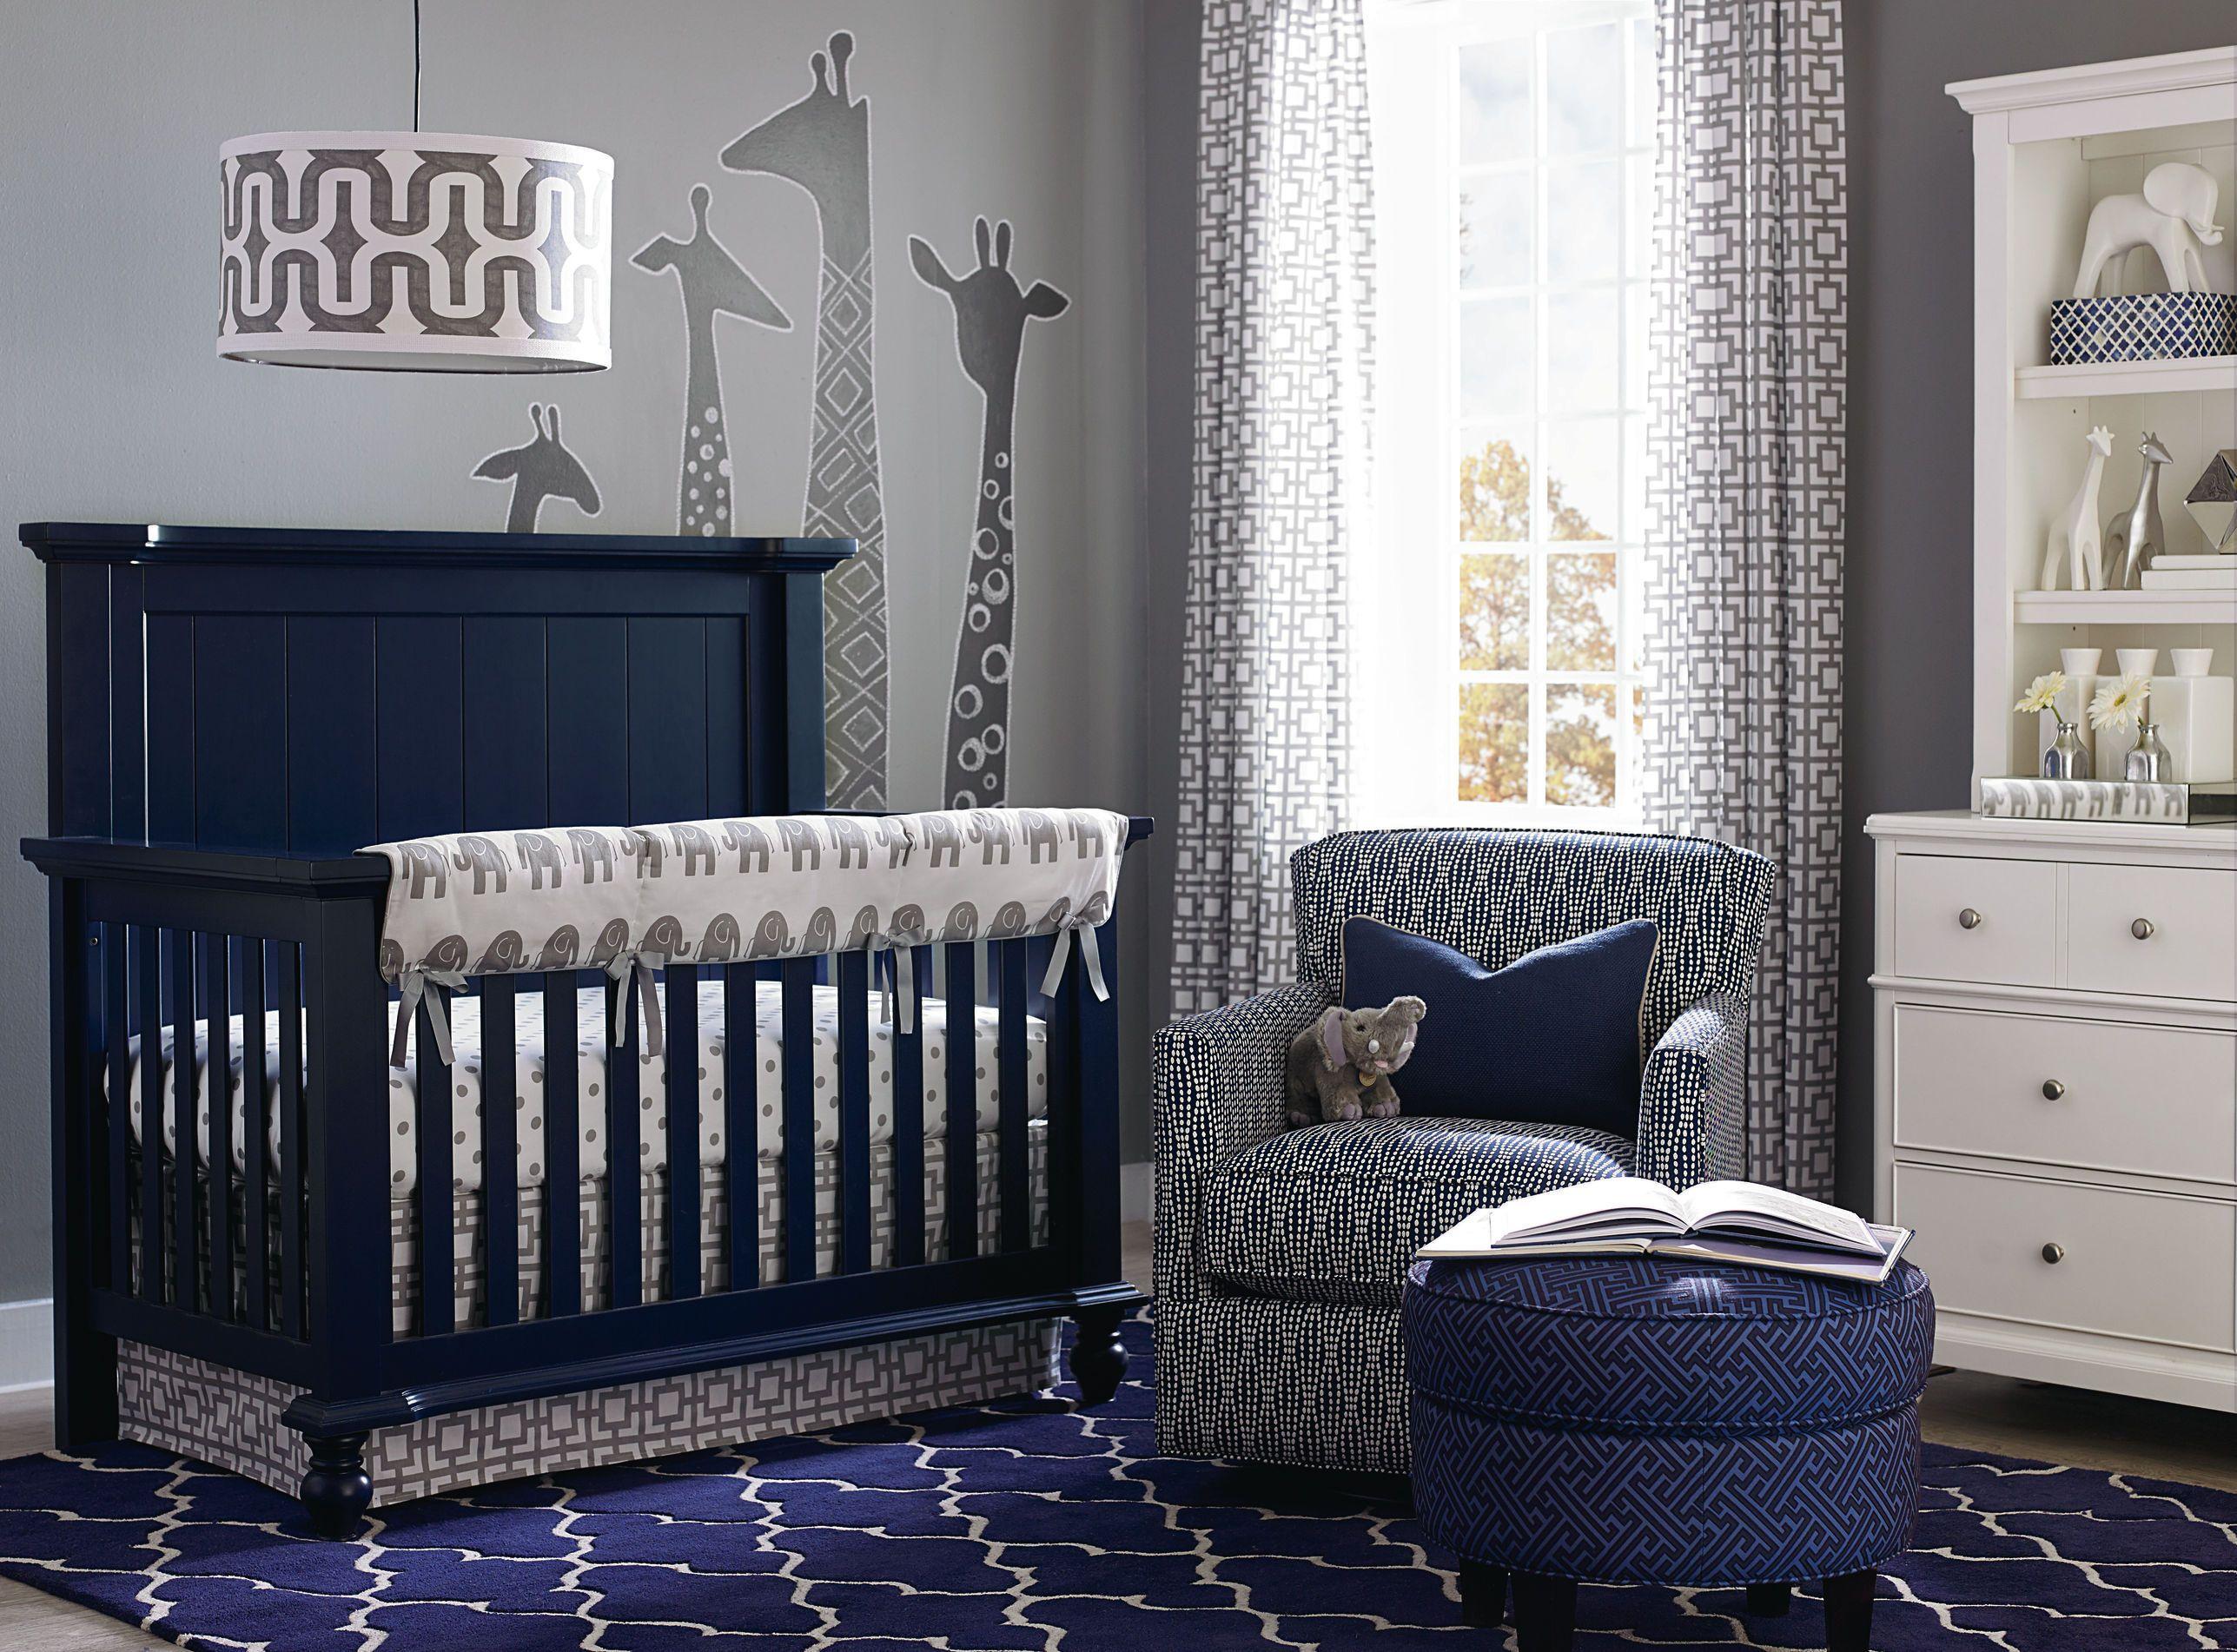 nursery bassett furniture boy contemporary visit southaven memphis homedecor needs